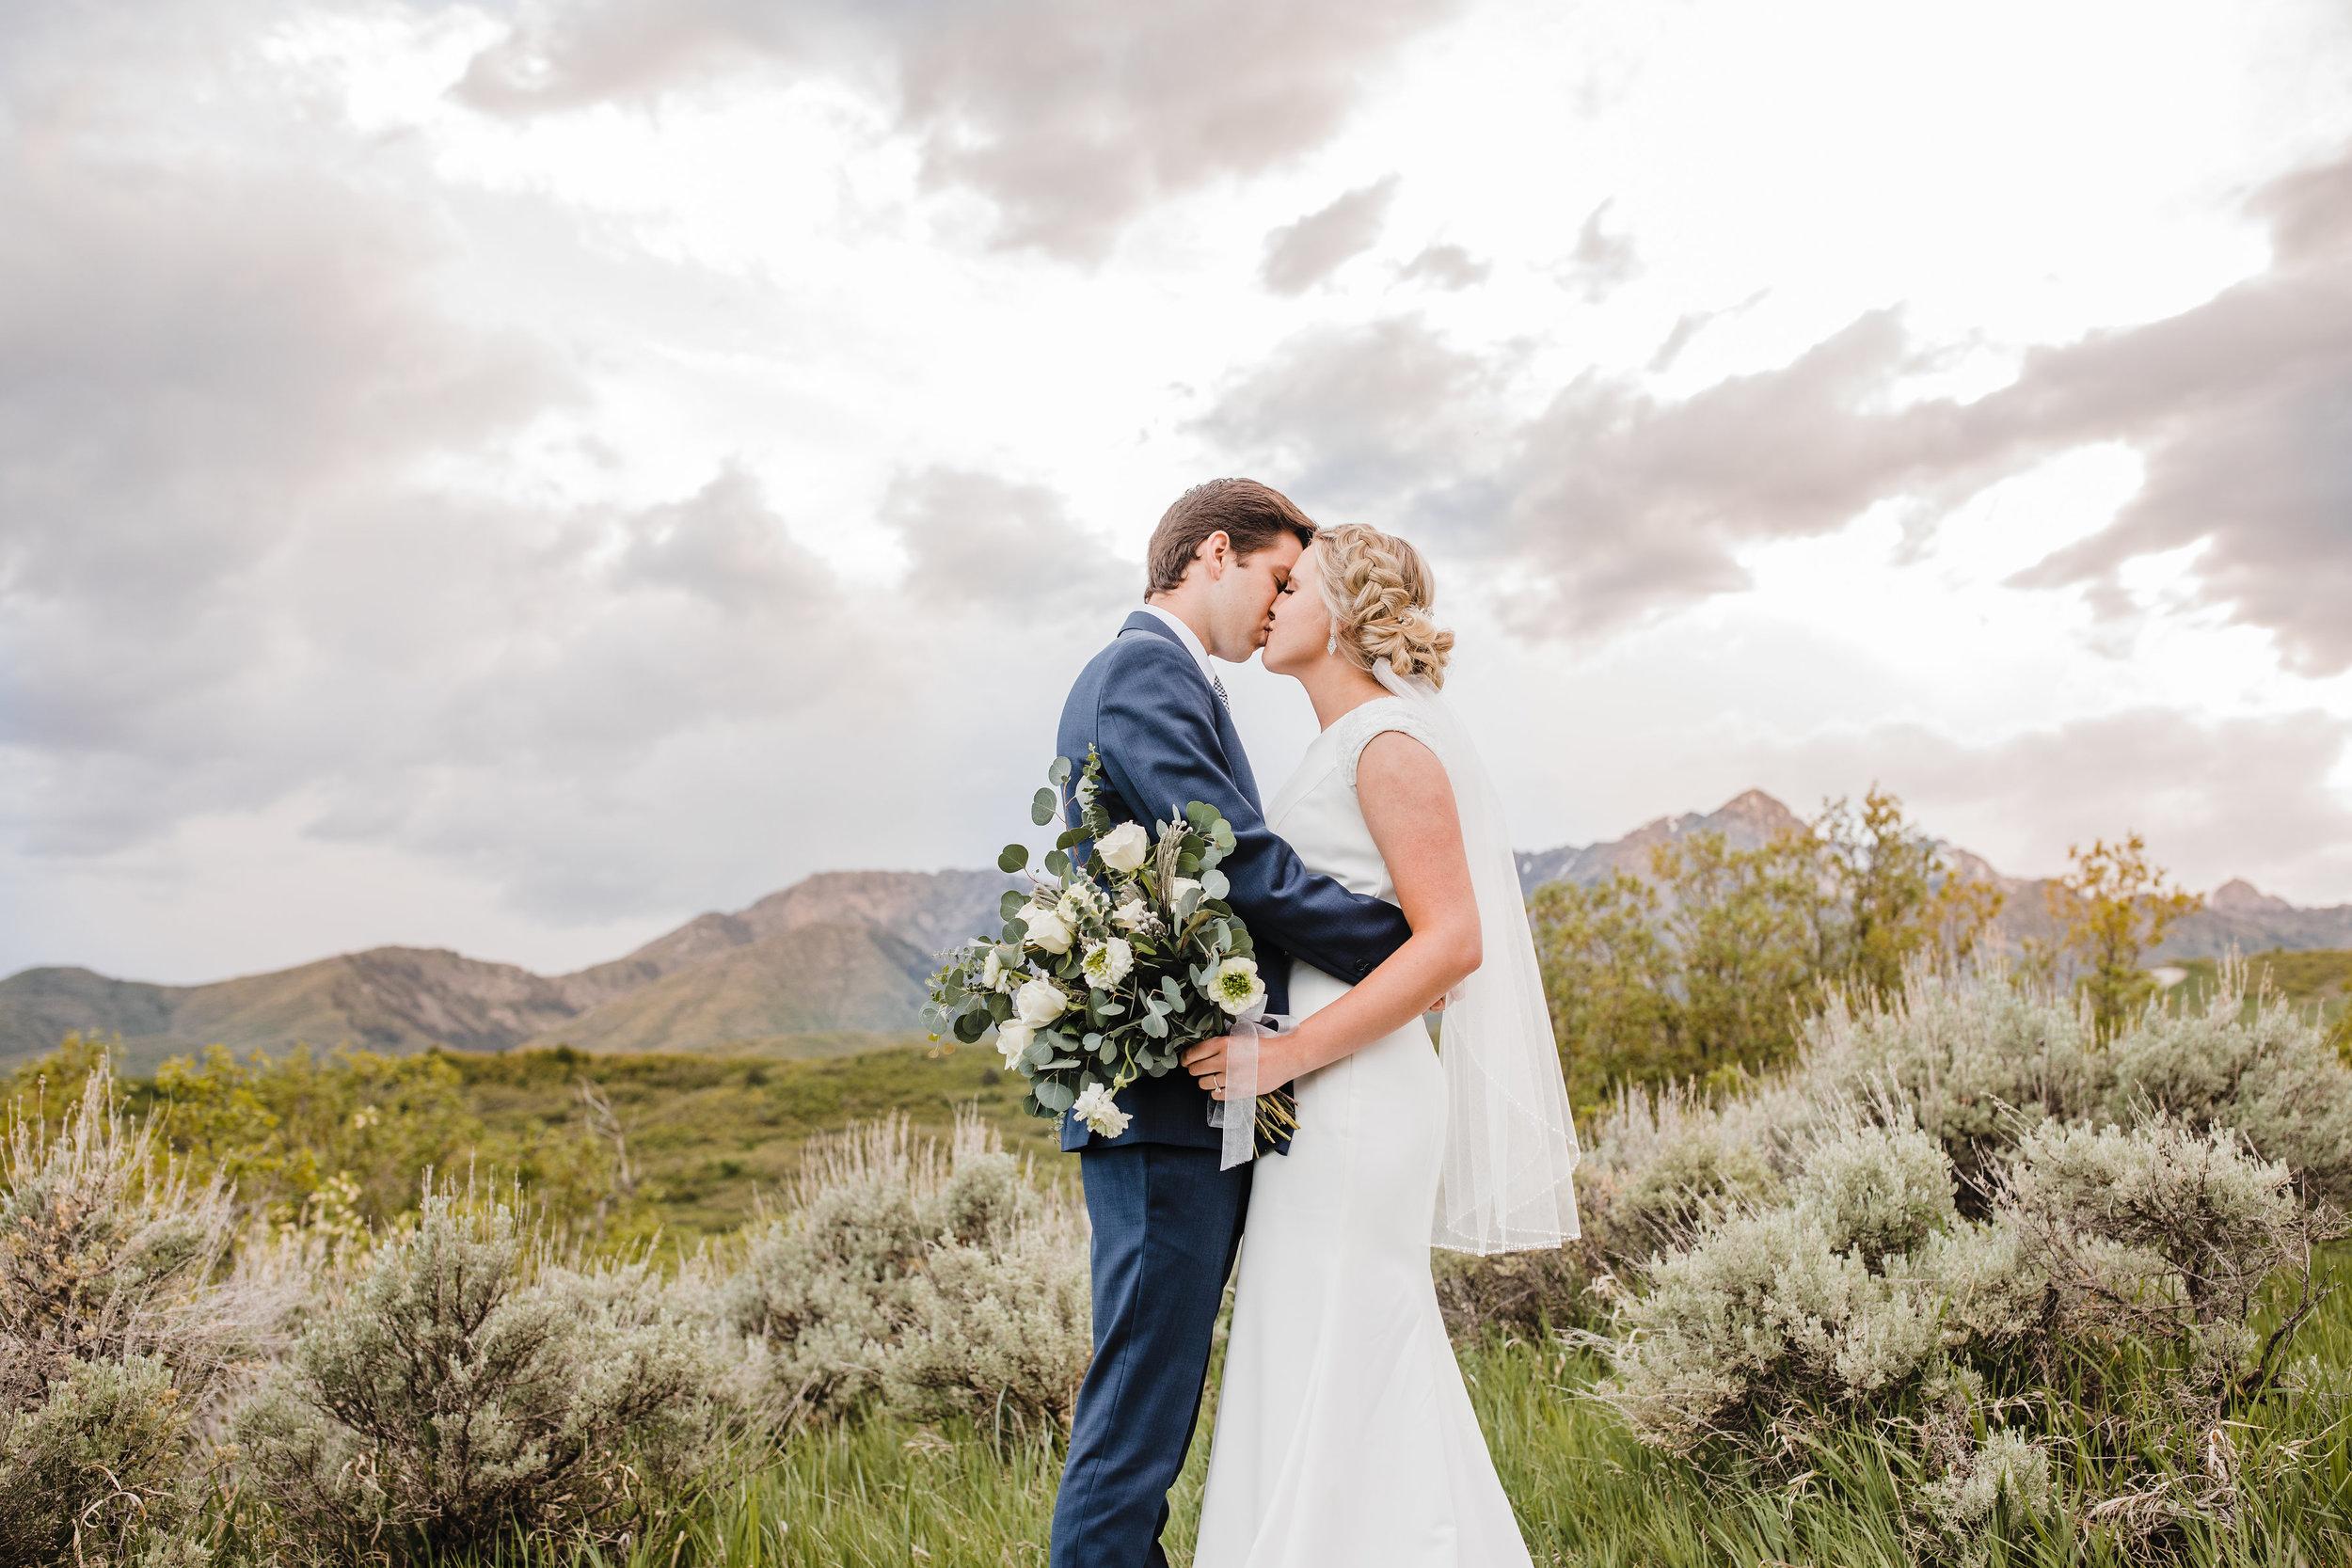 salt lake utah wedding photorgaphy stormy sunset mountains wildflower bouquet kissing